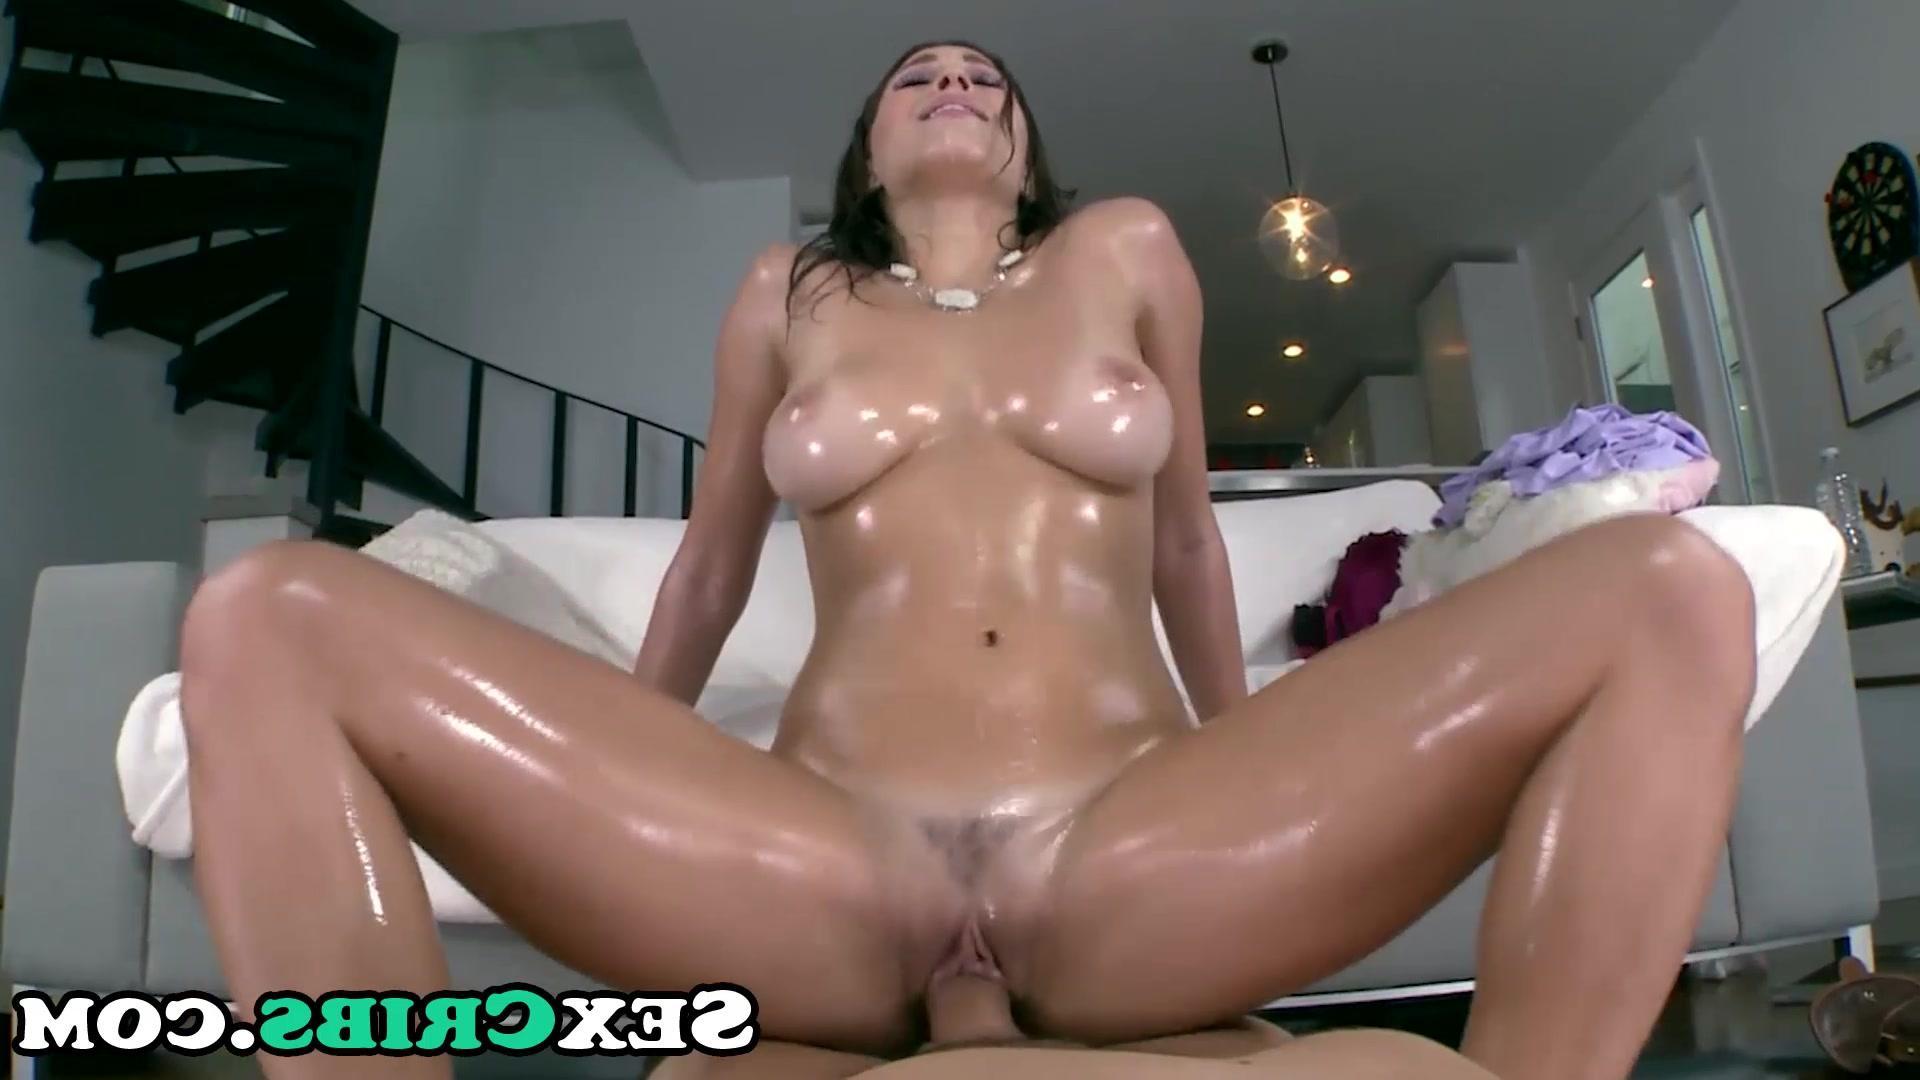 porno-onlayn-ot-1-litsa